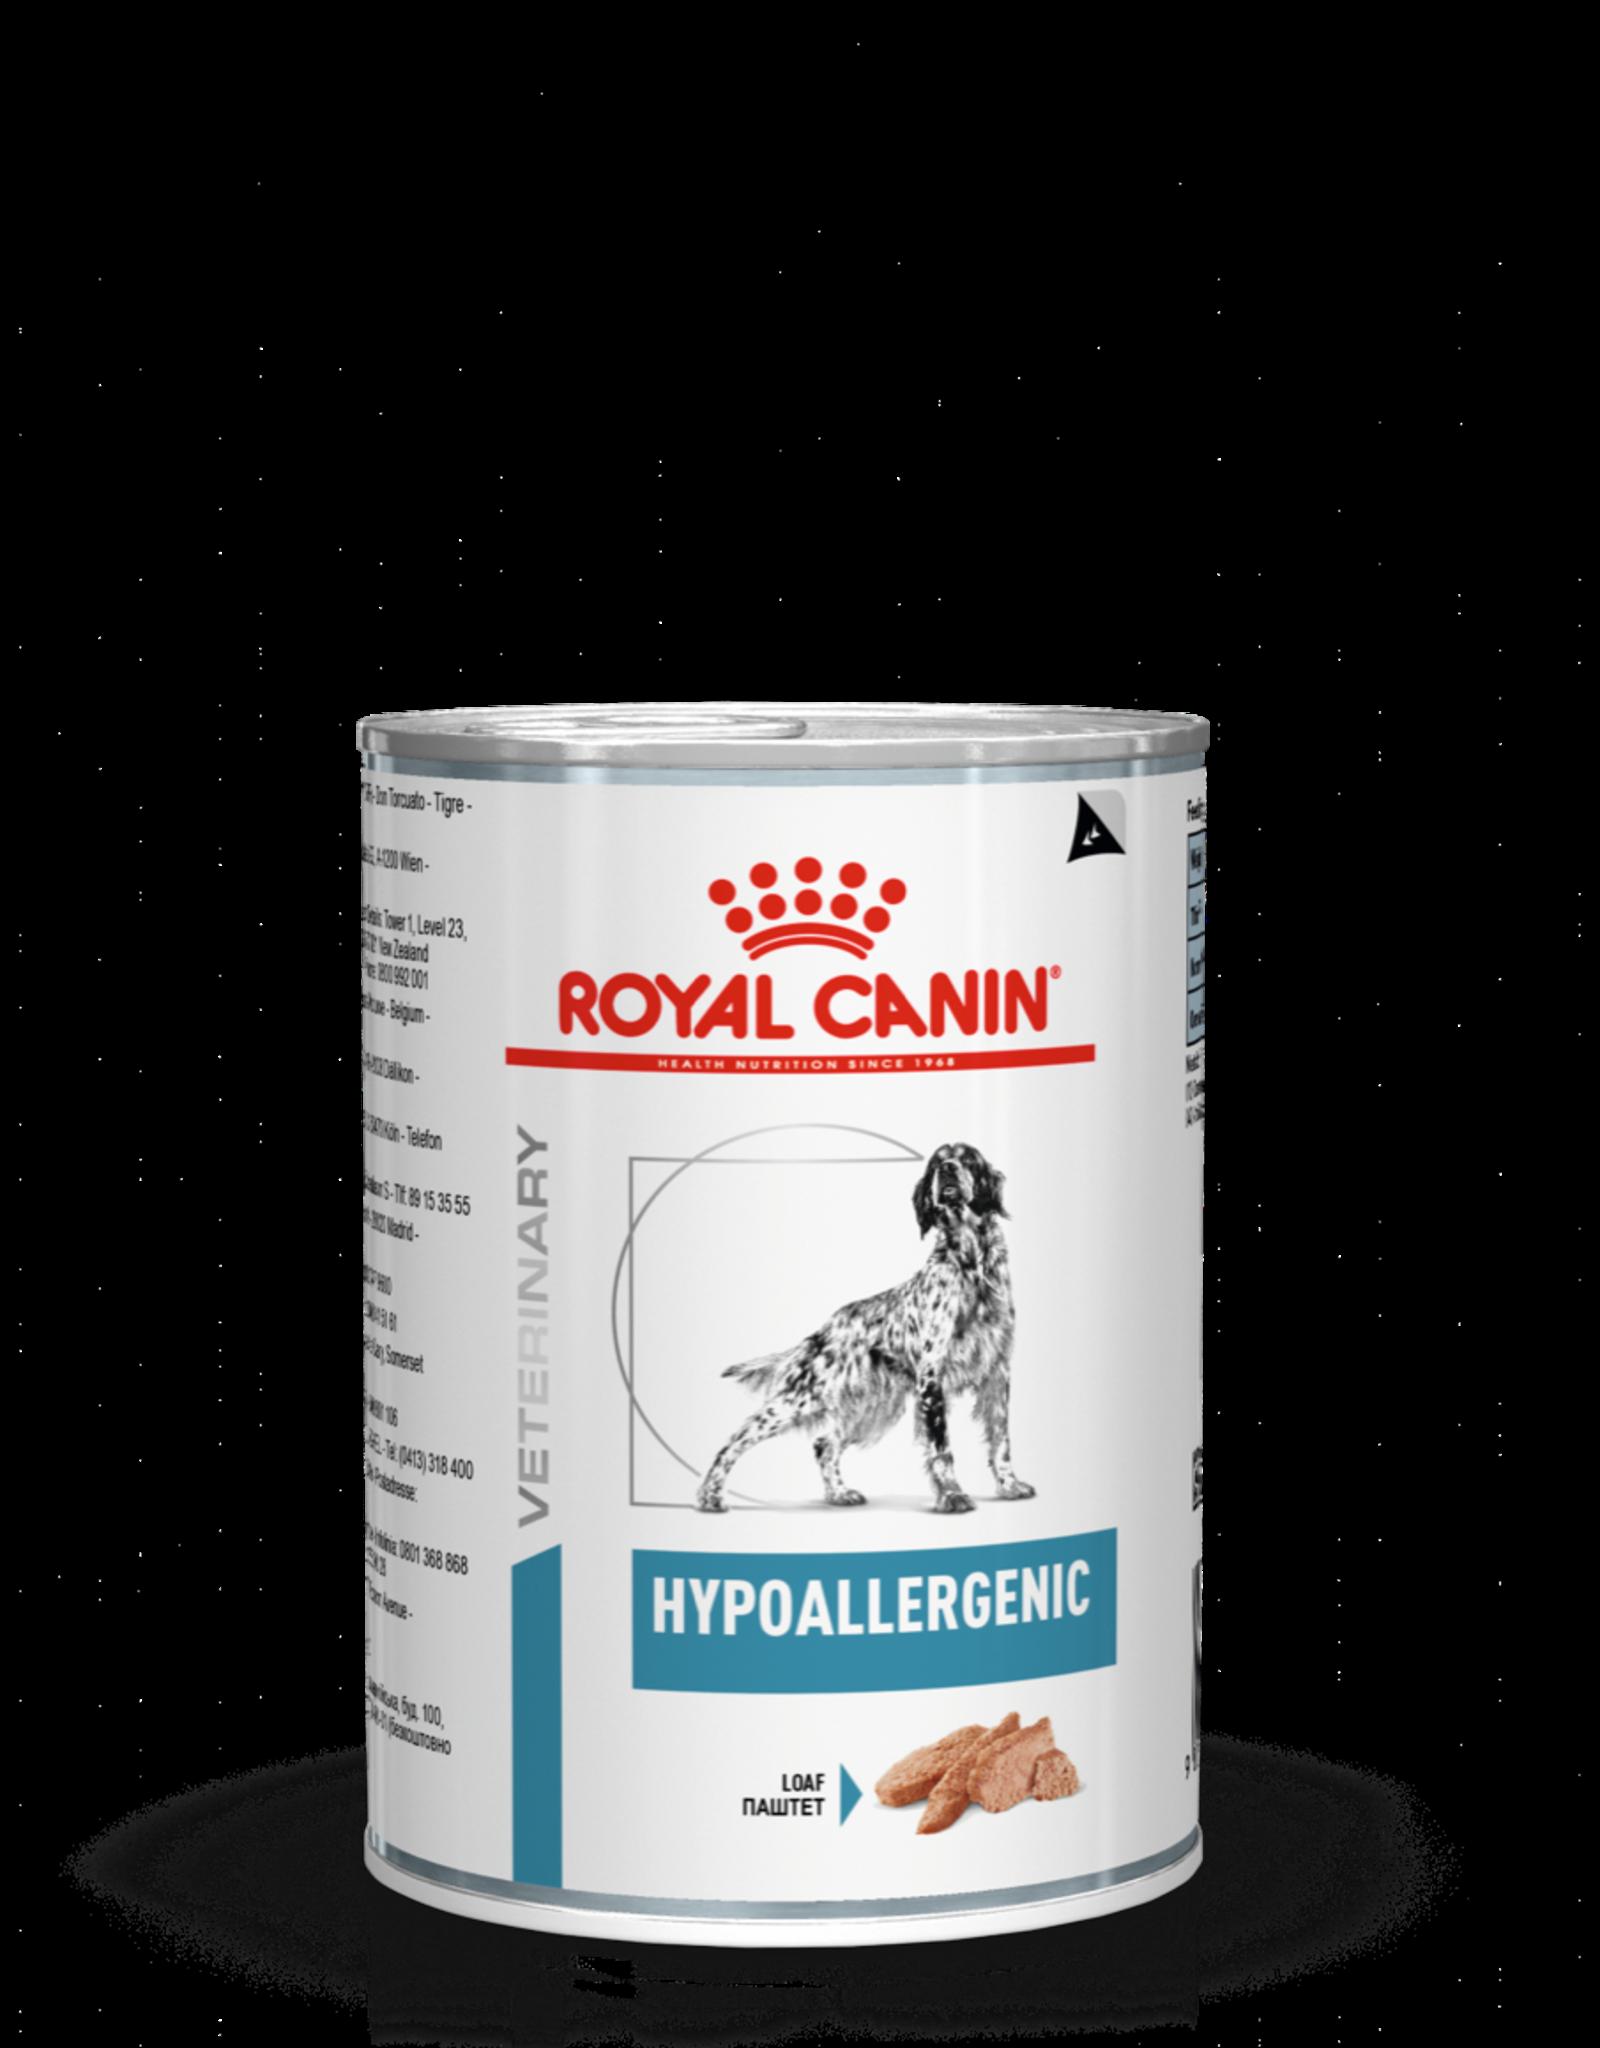 Royal Canin Royal Canin Hypoallergenic Hund 12x400gr